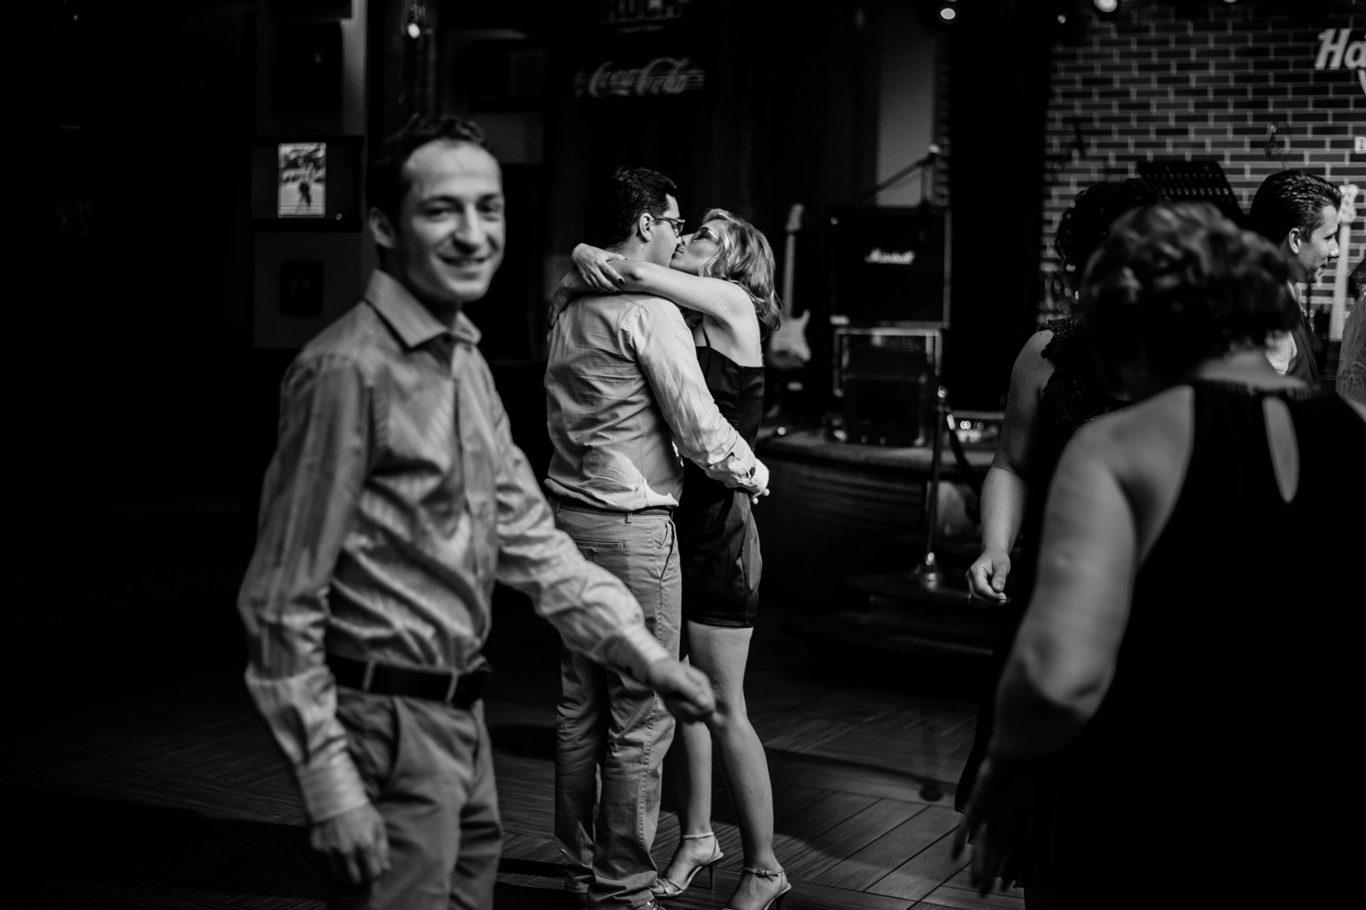 0646-fotografie-nunta-bucuresti-rodica-rares-fotograf-ciprian-dumitrescu-dsc_3194